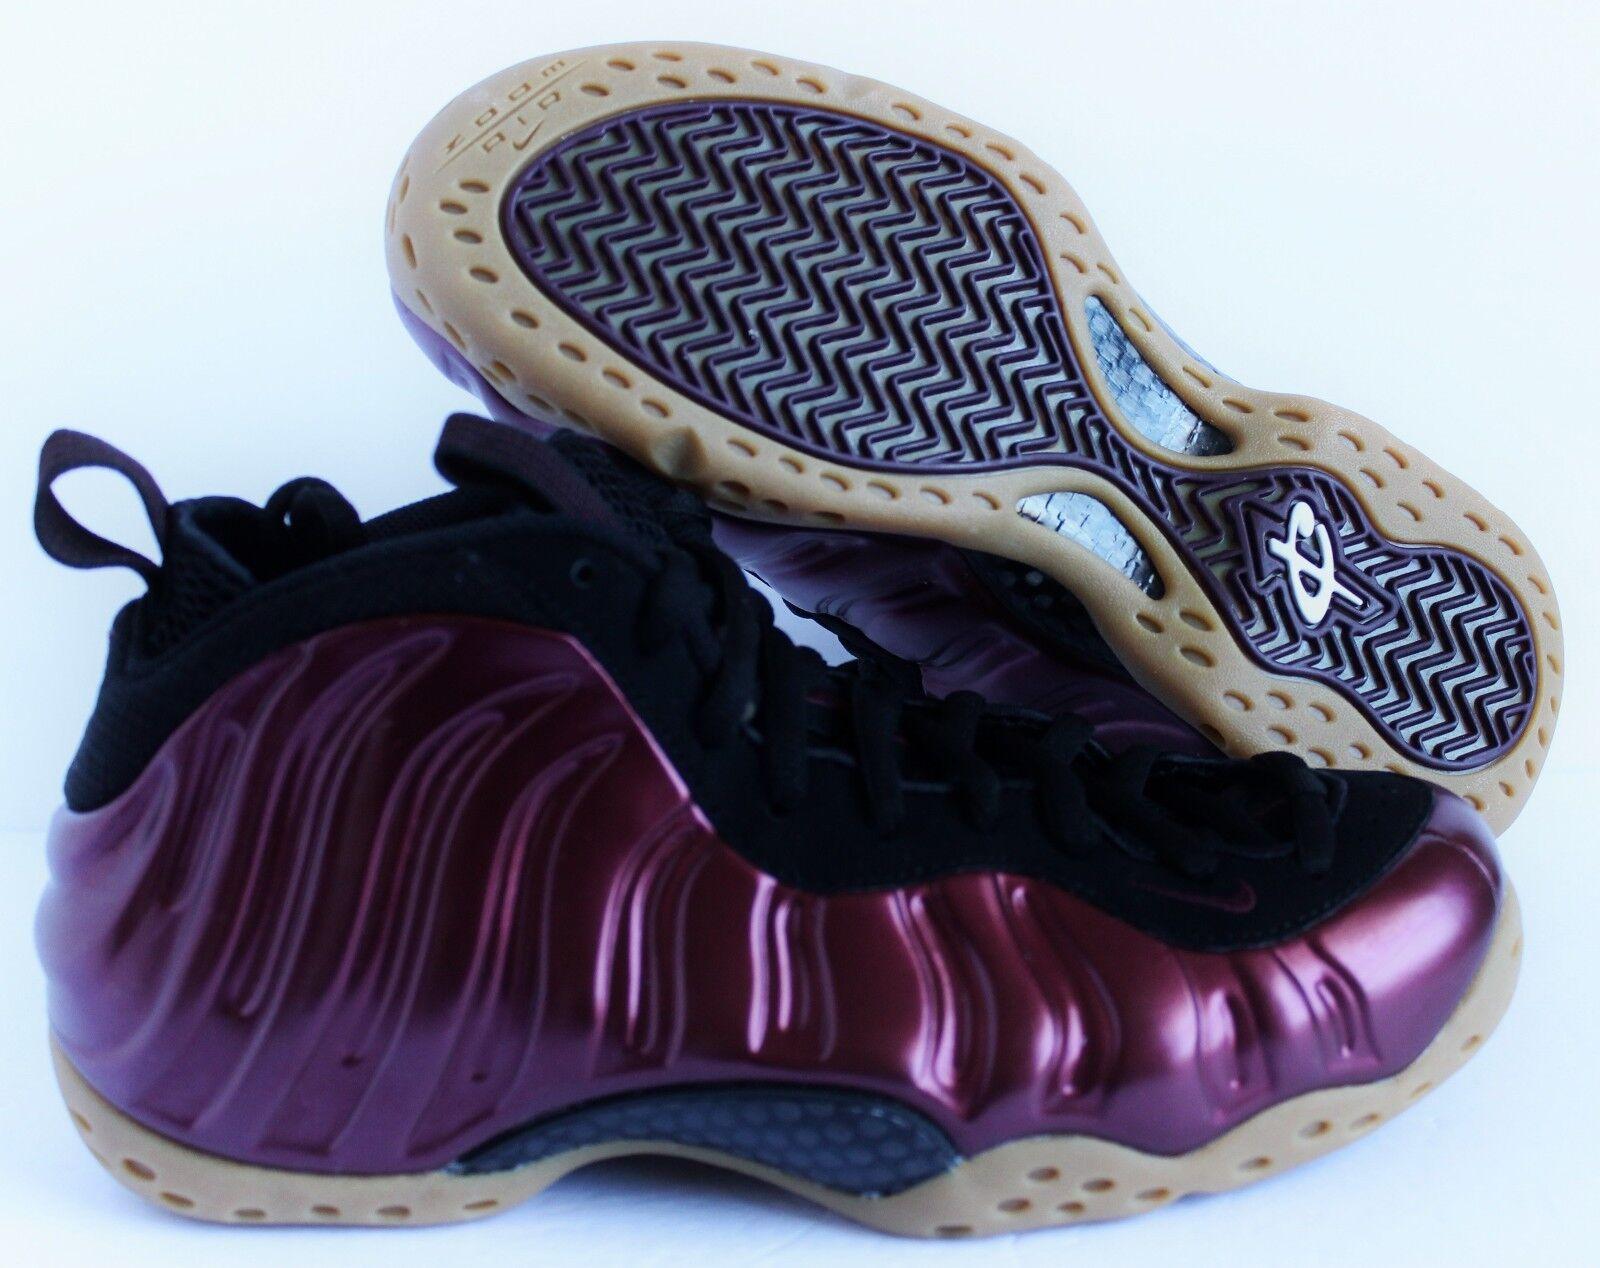 Los hombres de SZ Nike Air Foamposite one night maroon-Negro-gum SZ de 9 [314996-601] cd6f06